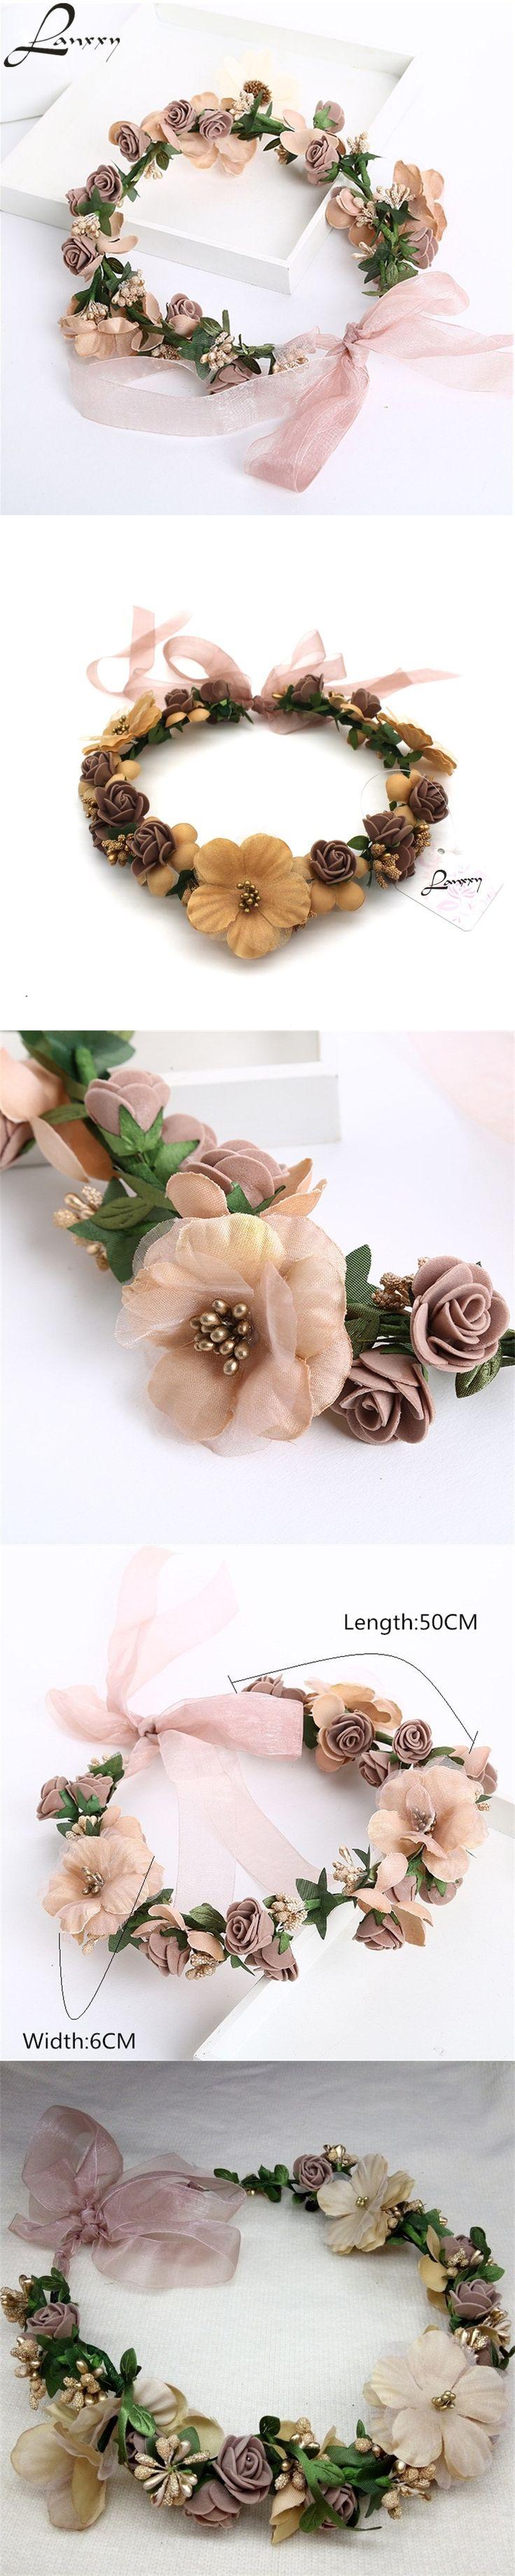 Lanxxy Hot Sale New 2016 Fashion Wedding Hair Accessories Wreath Tiaras Flower Headband Women Crown Bridal Hairbands